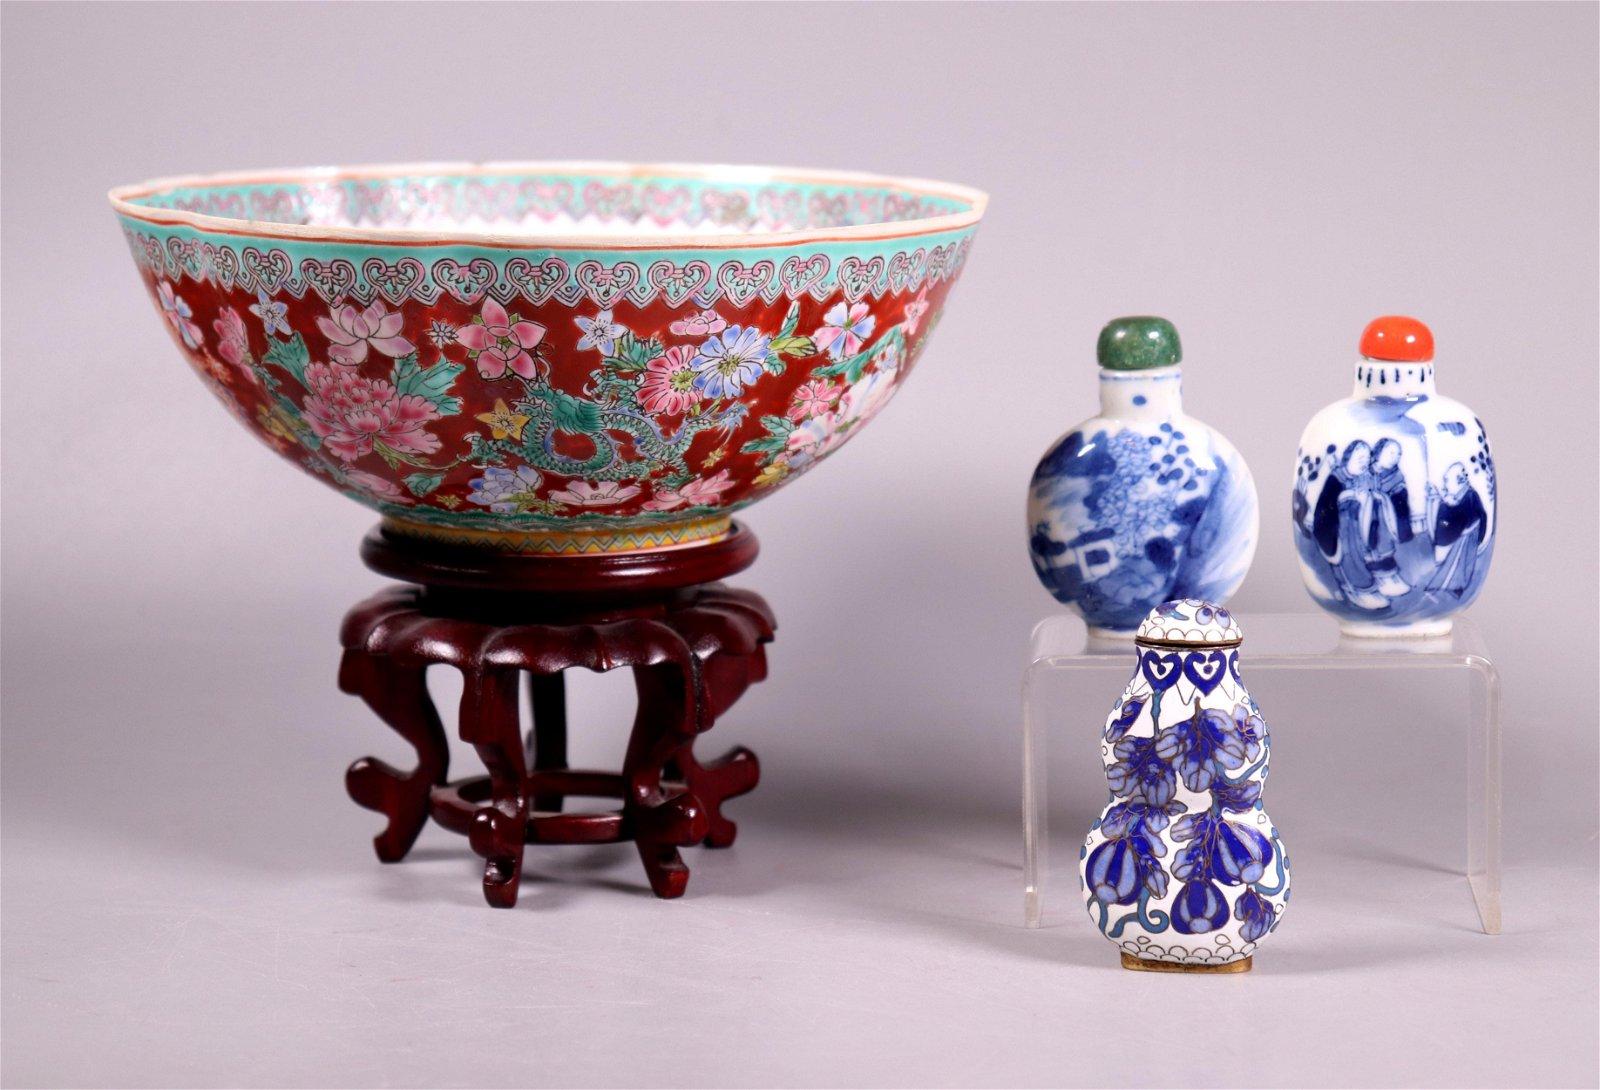 Chinese Snuffs 2 B & W Porcelain Cloisonne; & Bowl